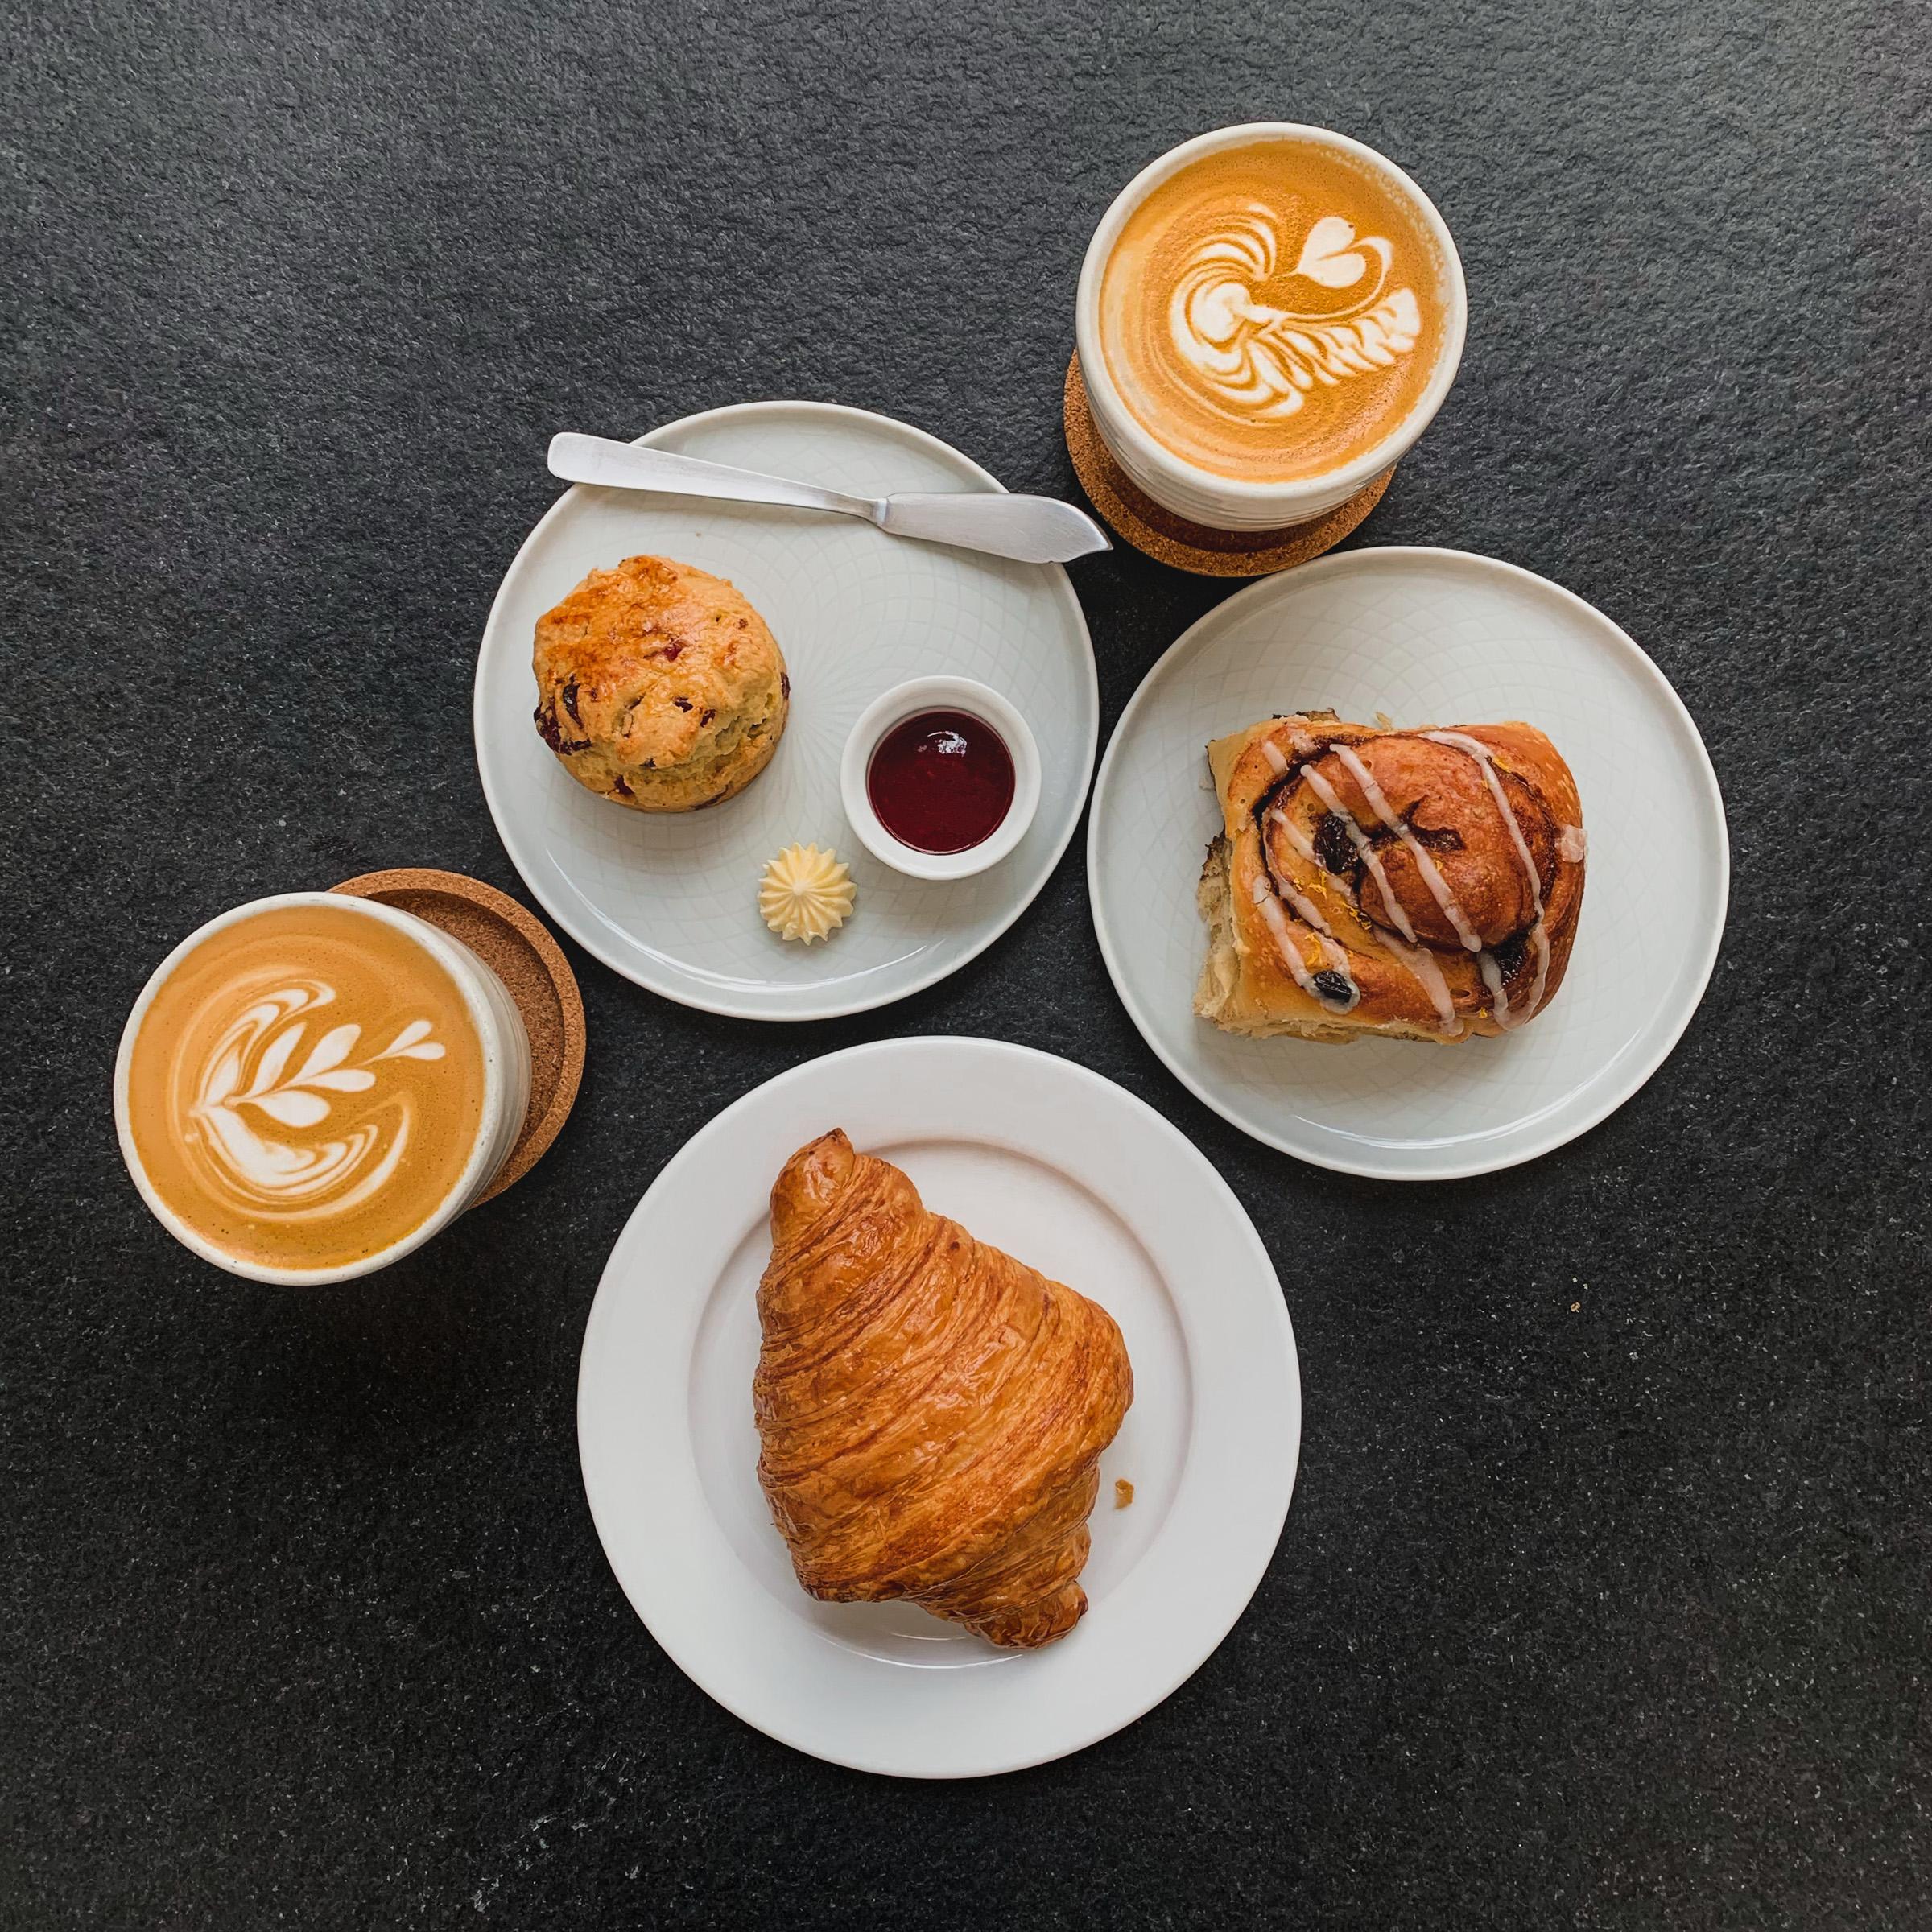 Lifestyle photography : Croissant, scone, cinnamon roll, latte spread, RollingBear Travels blog.